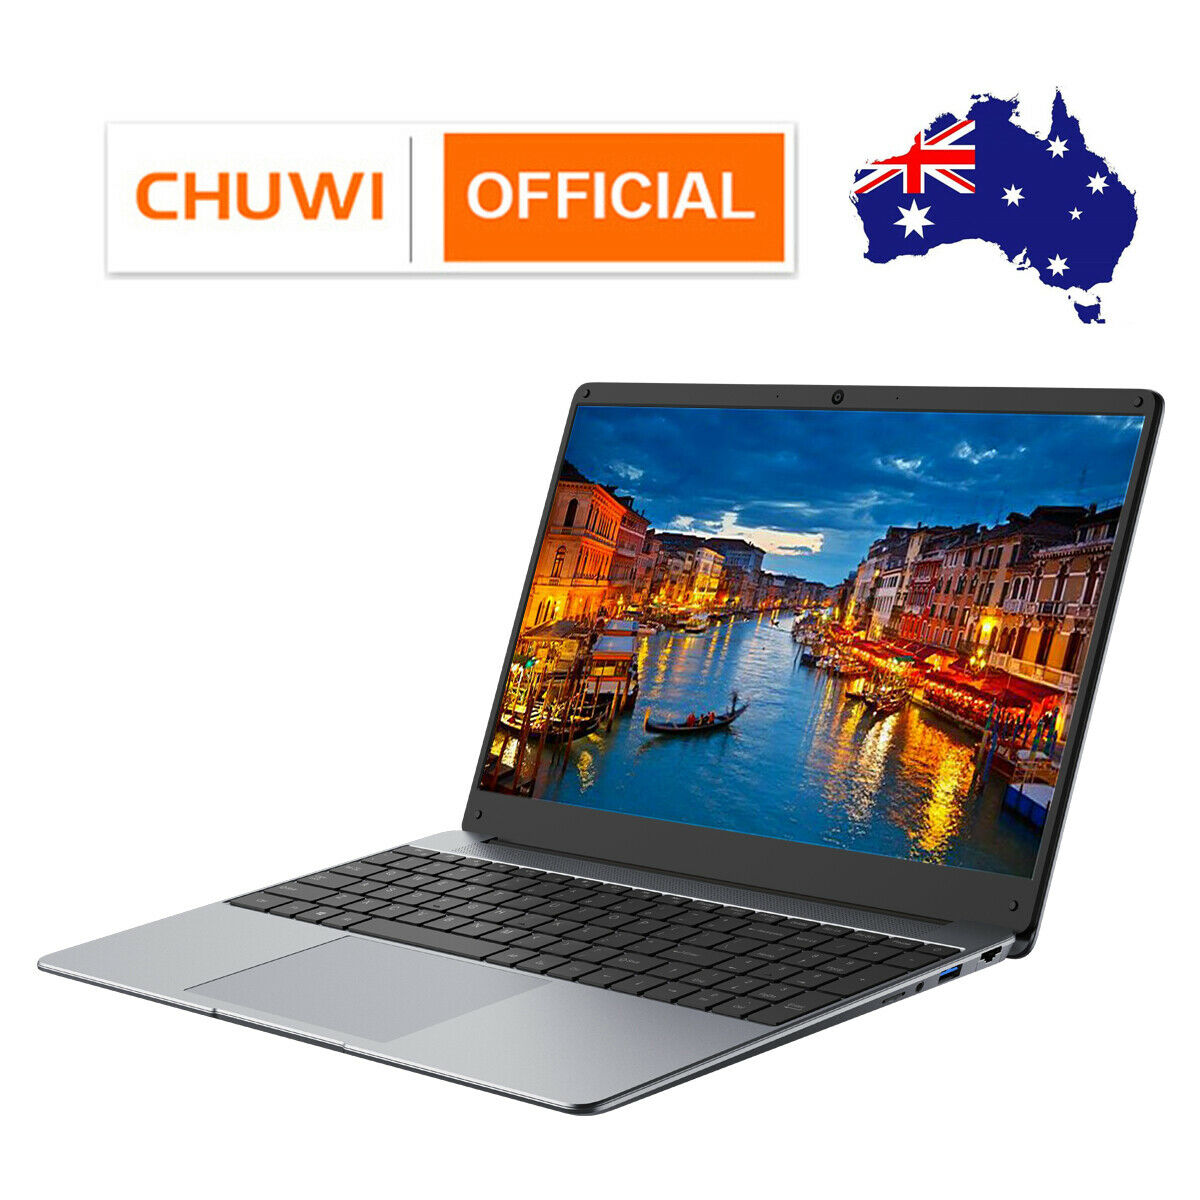 Laptop Windows - CHUWI HeroBook GemiBook CoreBook Pro/Plus/X Laptop Windows Intel Core 16+512GB